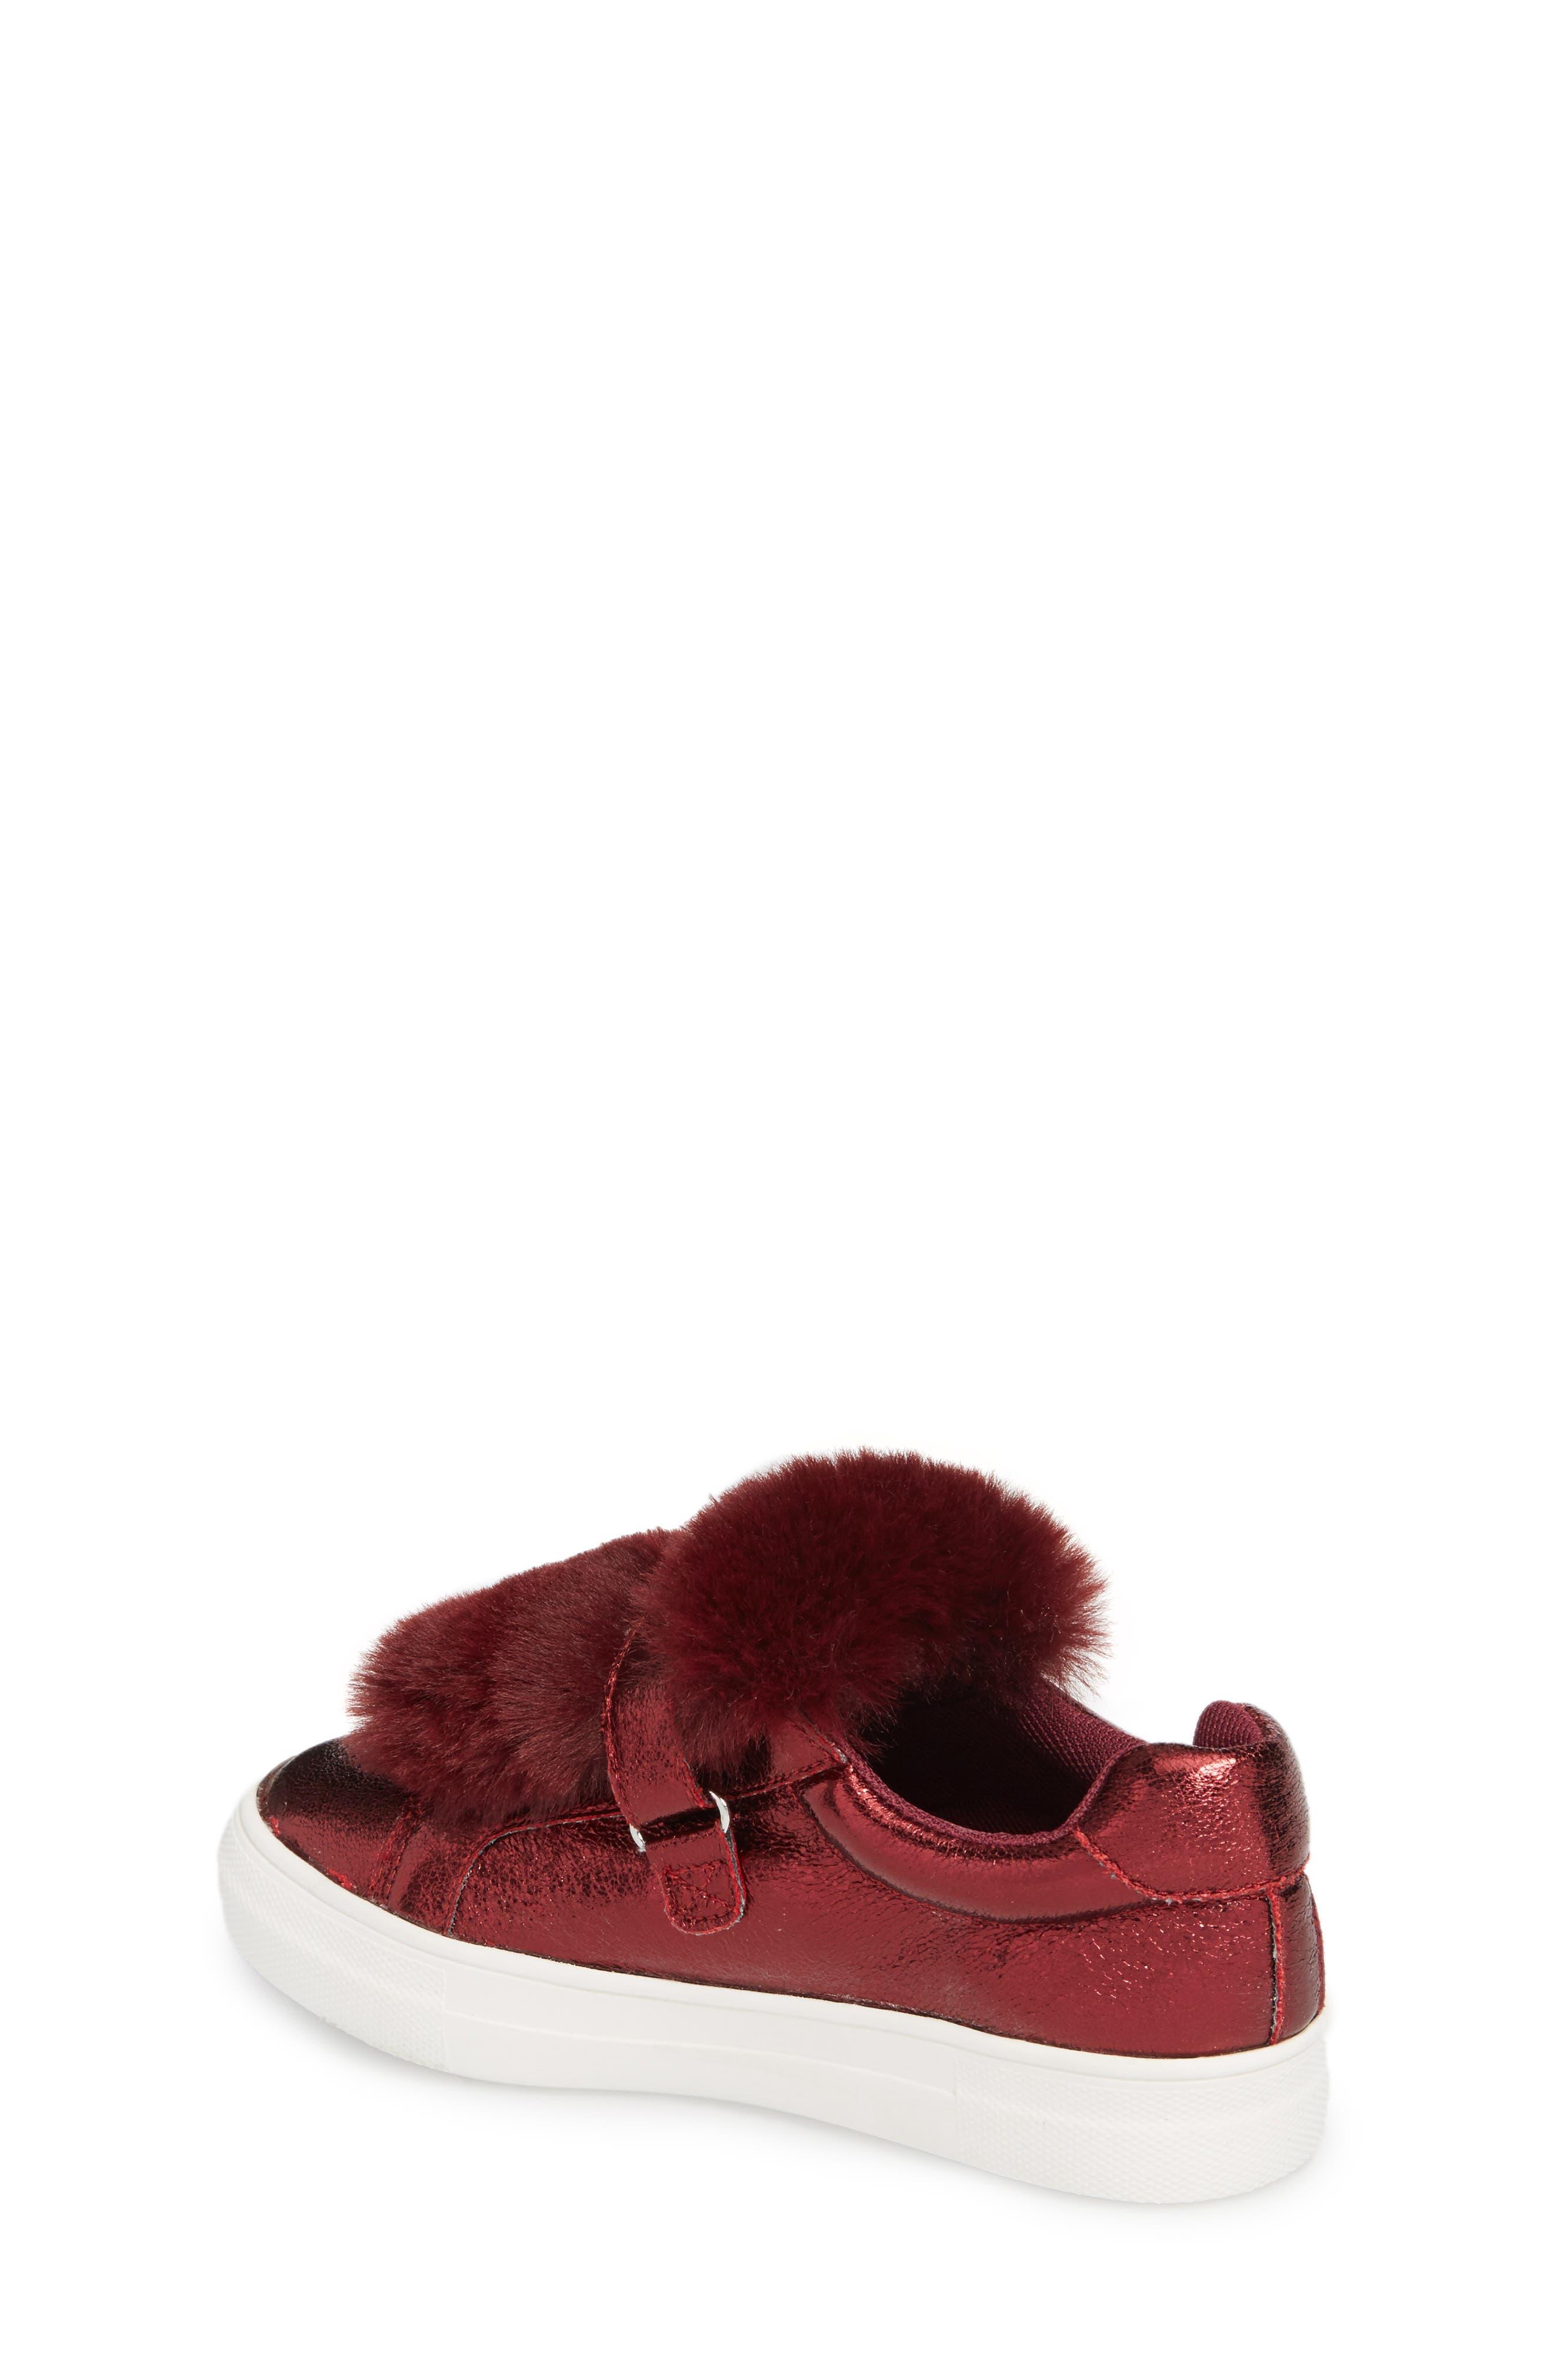 Zandra Faux Fur Metallic Sneaker,                             Alternate thumbnail 2, color,                             Burgundy Faux Leather